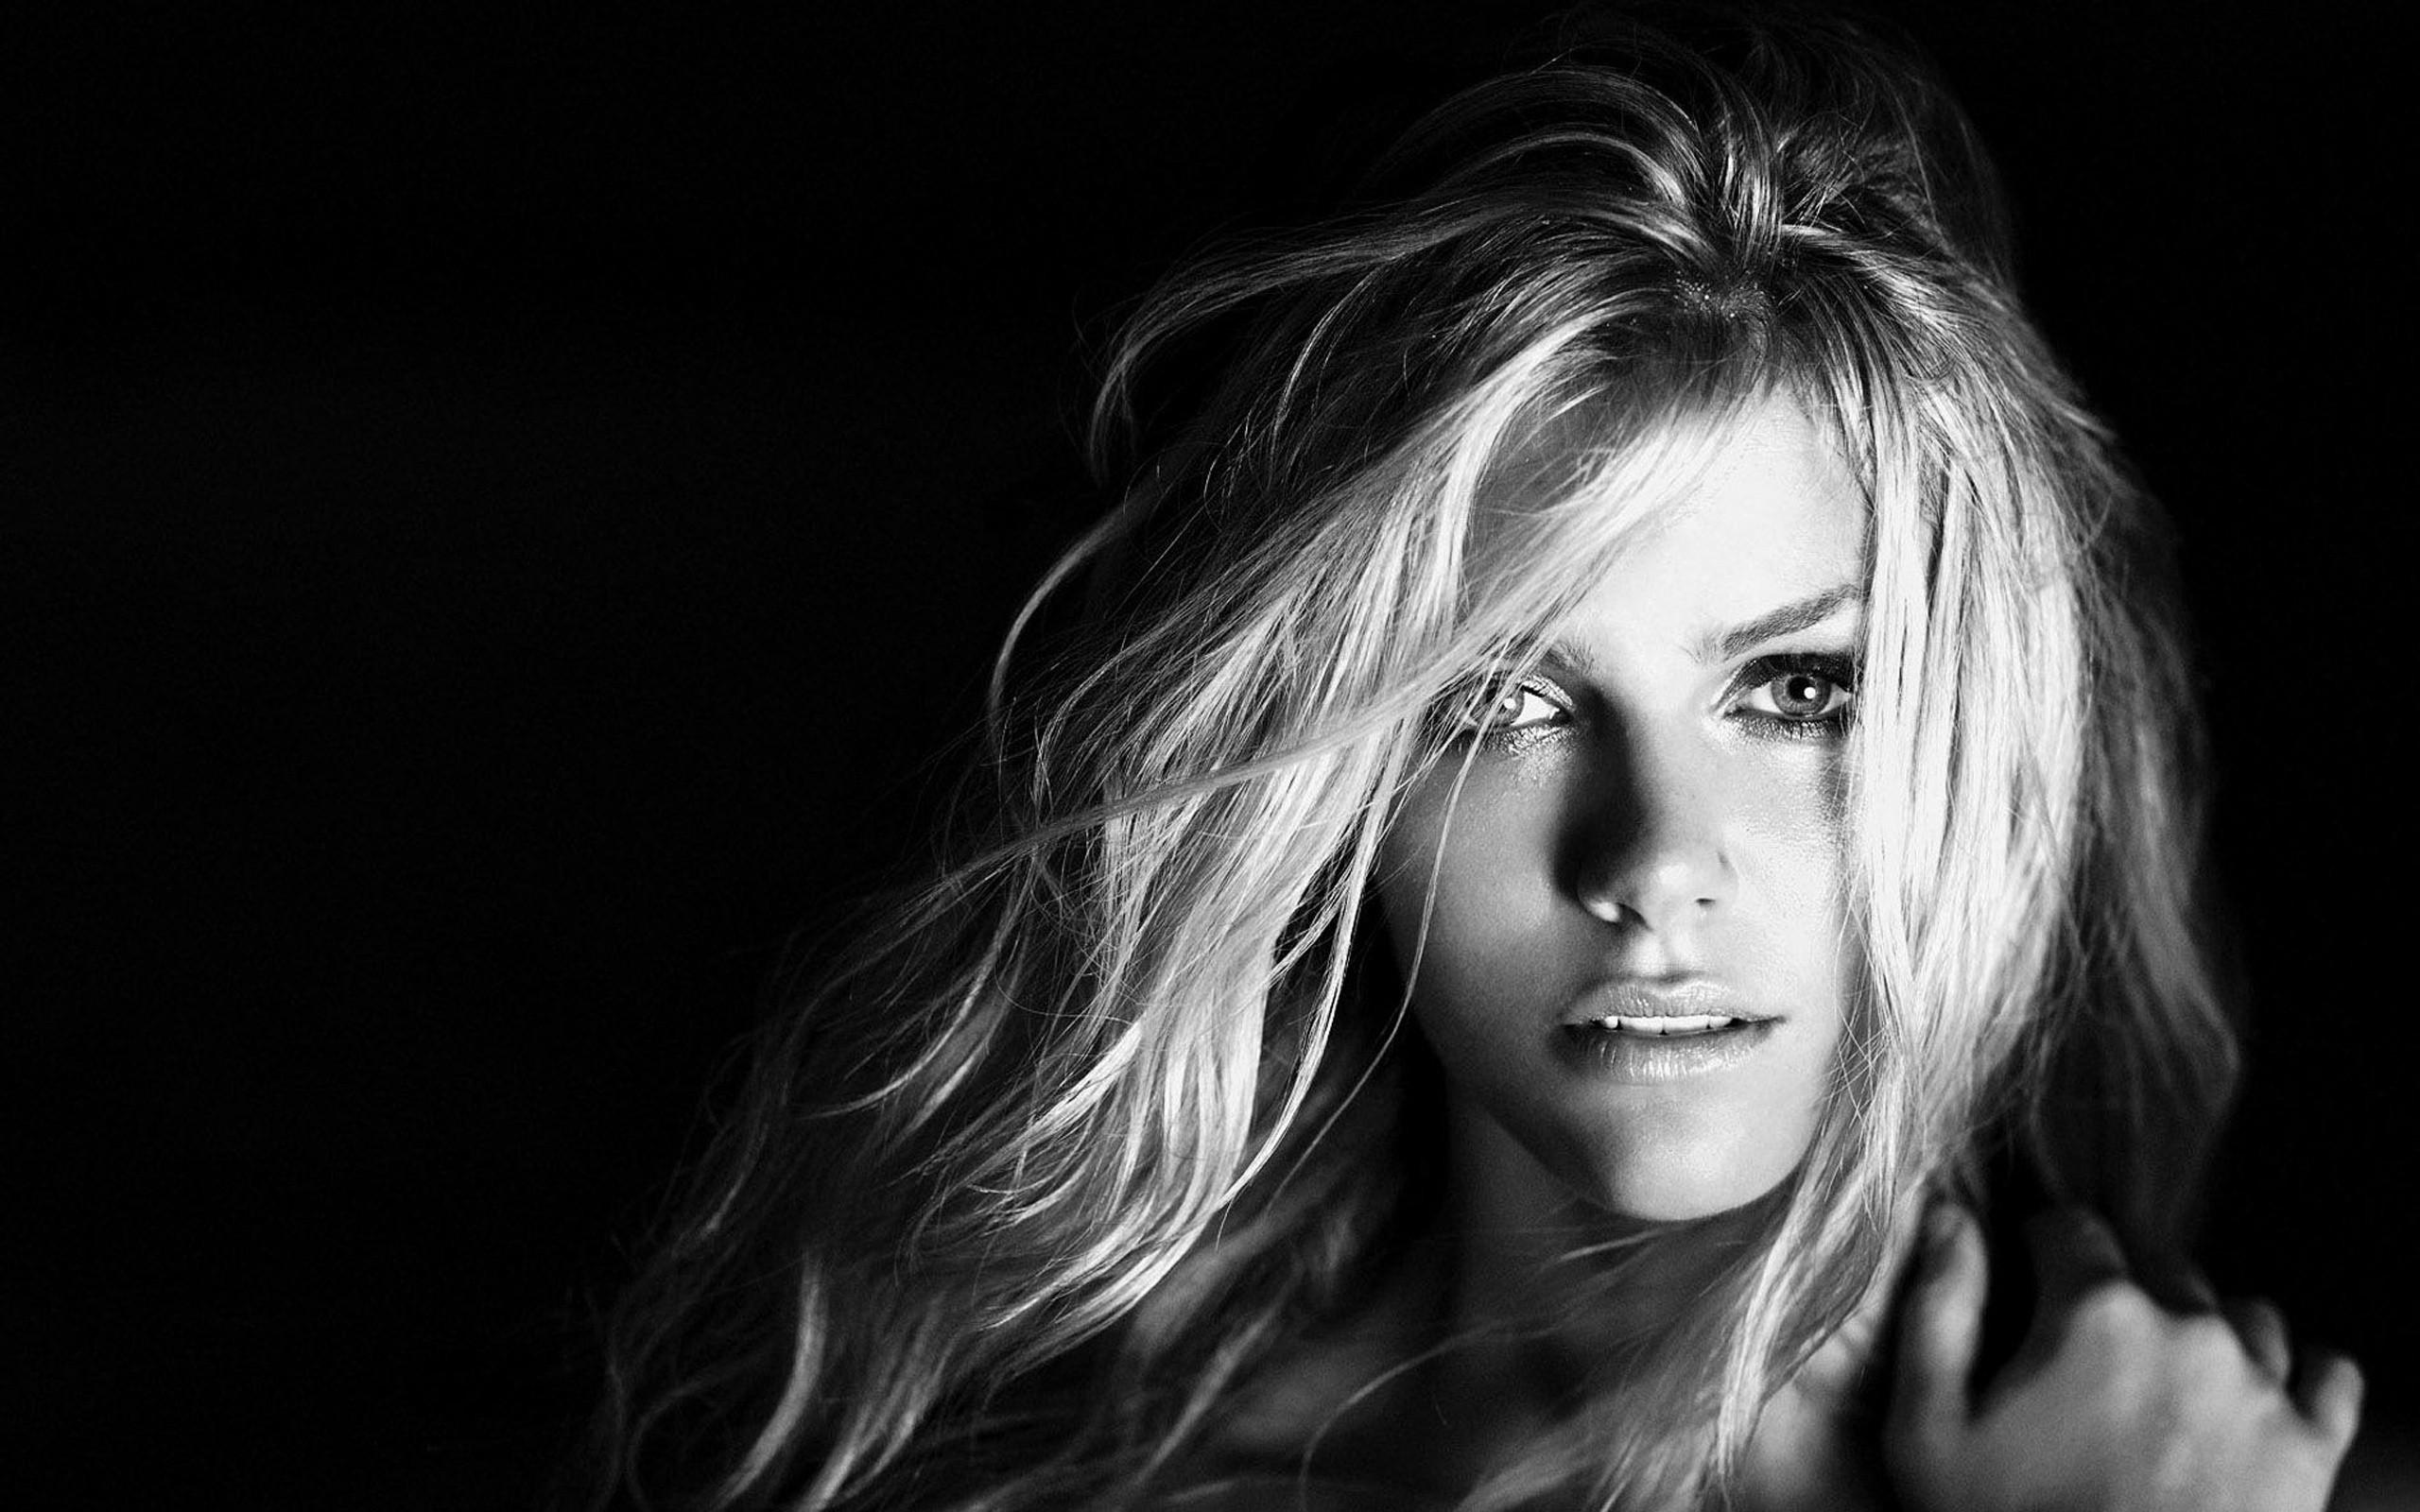 sexy-girl-wallpaper-12;  blondes_women_models_brooklyn_decker_monochrome_black_background_2560x1600_wallpaper_Wallpaper_2560x1600_www_wallpaperswa_com